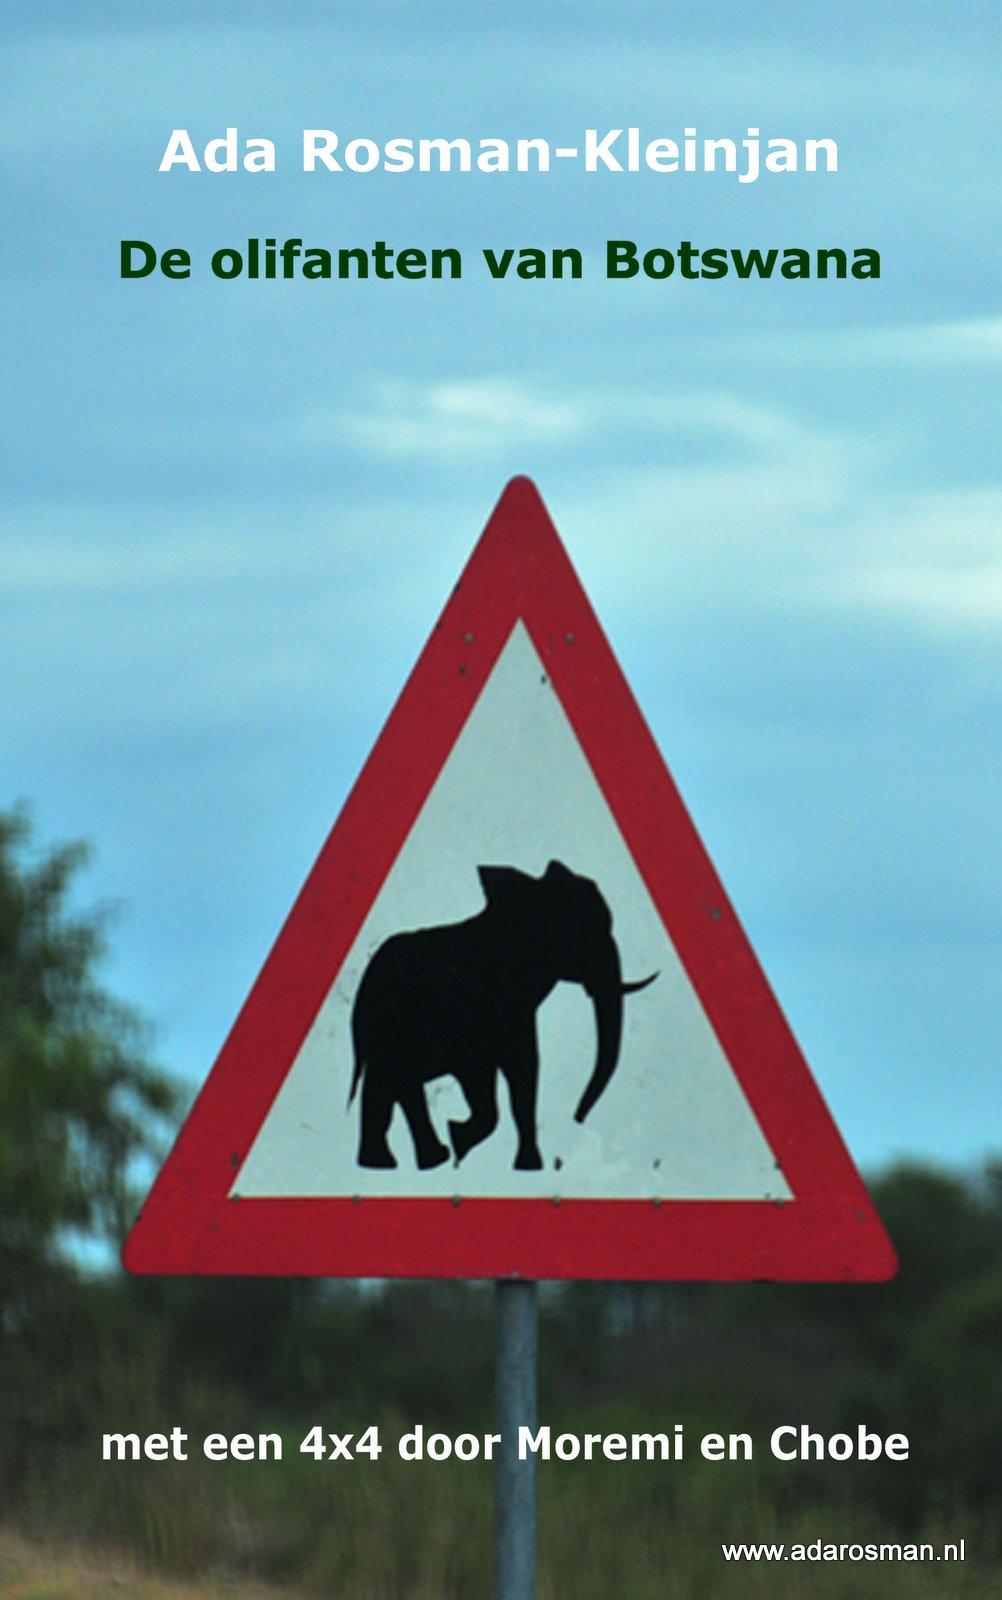 Reisverhaal De olifanten van Botswana | Ada Rosman <br/>€ 9.50 <br/> <a href='https://www.dezwerver.nl/reisgidsen/?tt=1554_252853_241358_&r=https%3A%2F%2Fwww.dezwerver.nl%2Fr%2Fafrika%2Fbotswana%2Fc%2Fboeken%2Freisverhalen%2F9783739227238%2Freisverhaal-de-olifanten-van-botswana-ada-rosman%2F' target='_blank'>Meer Info</a>